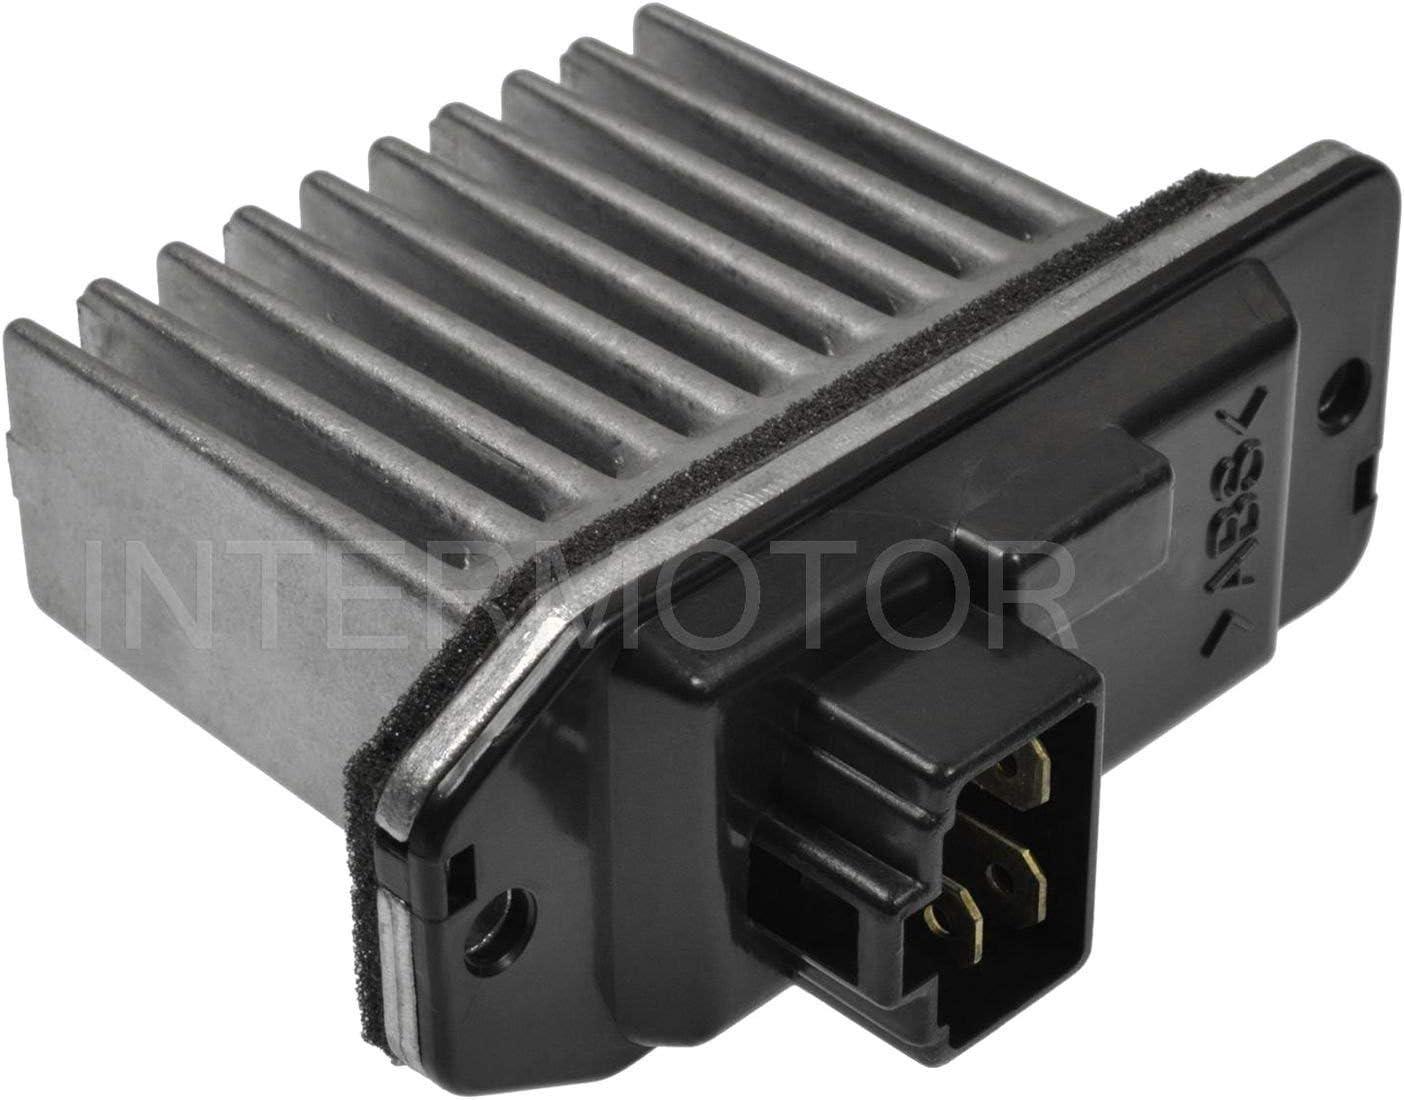 Intermotor Blower Motor Resistor RU885